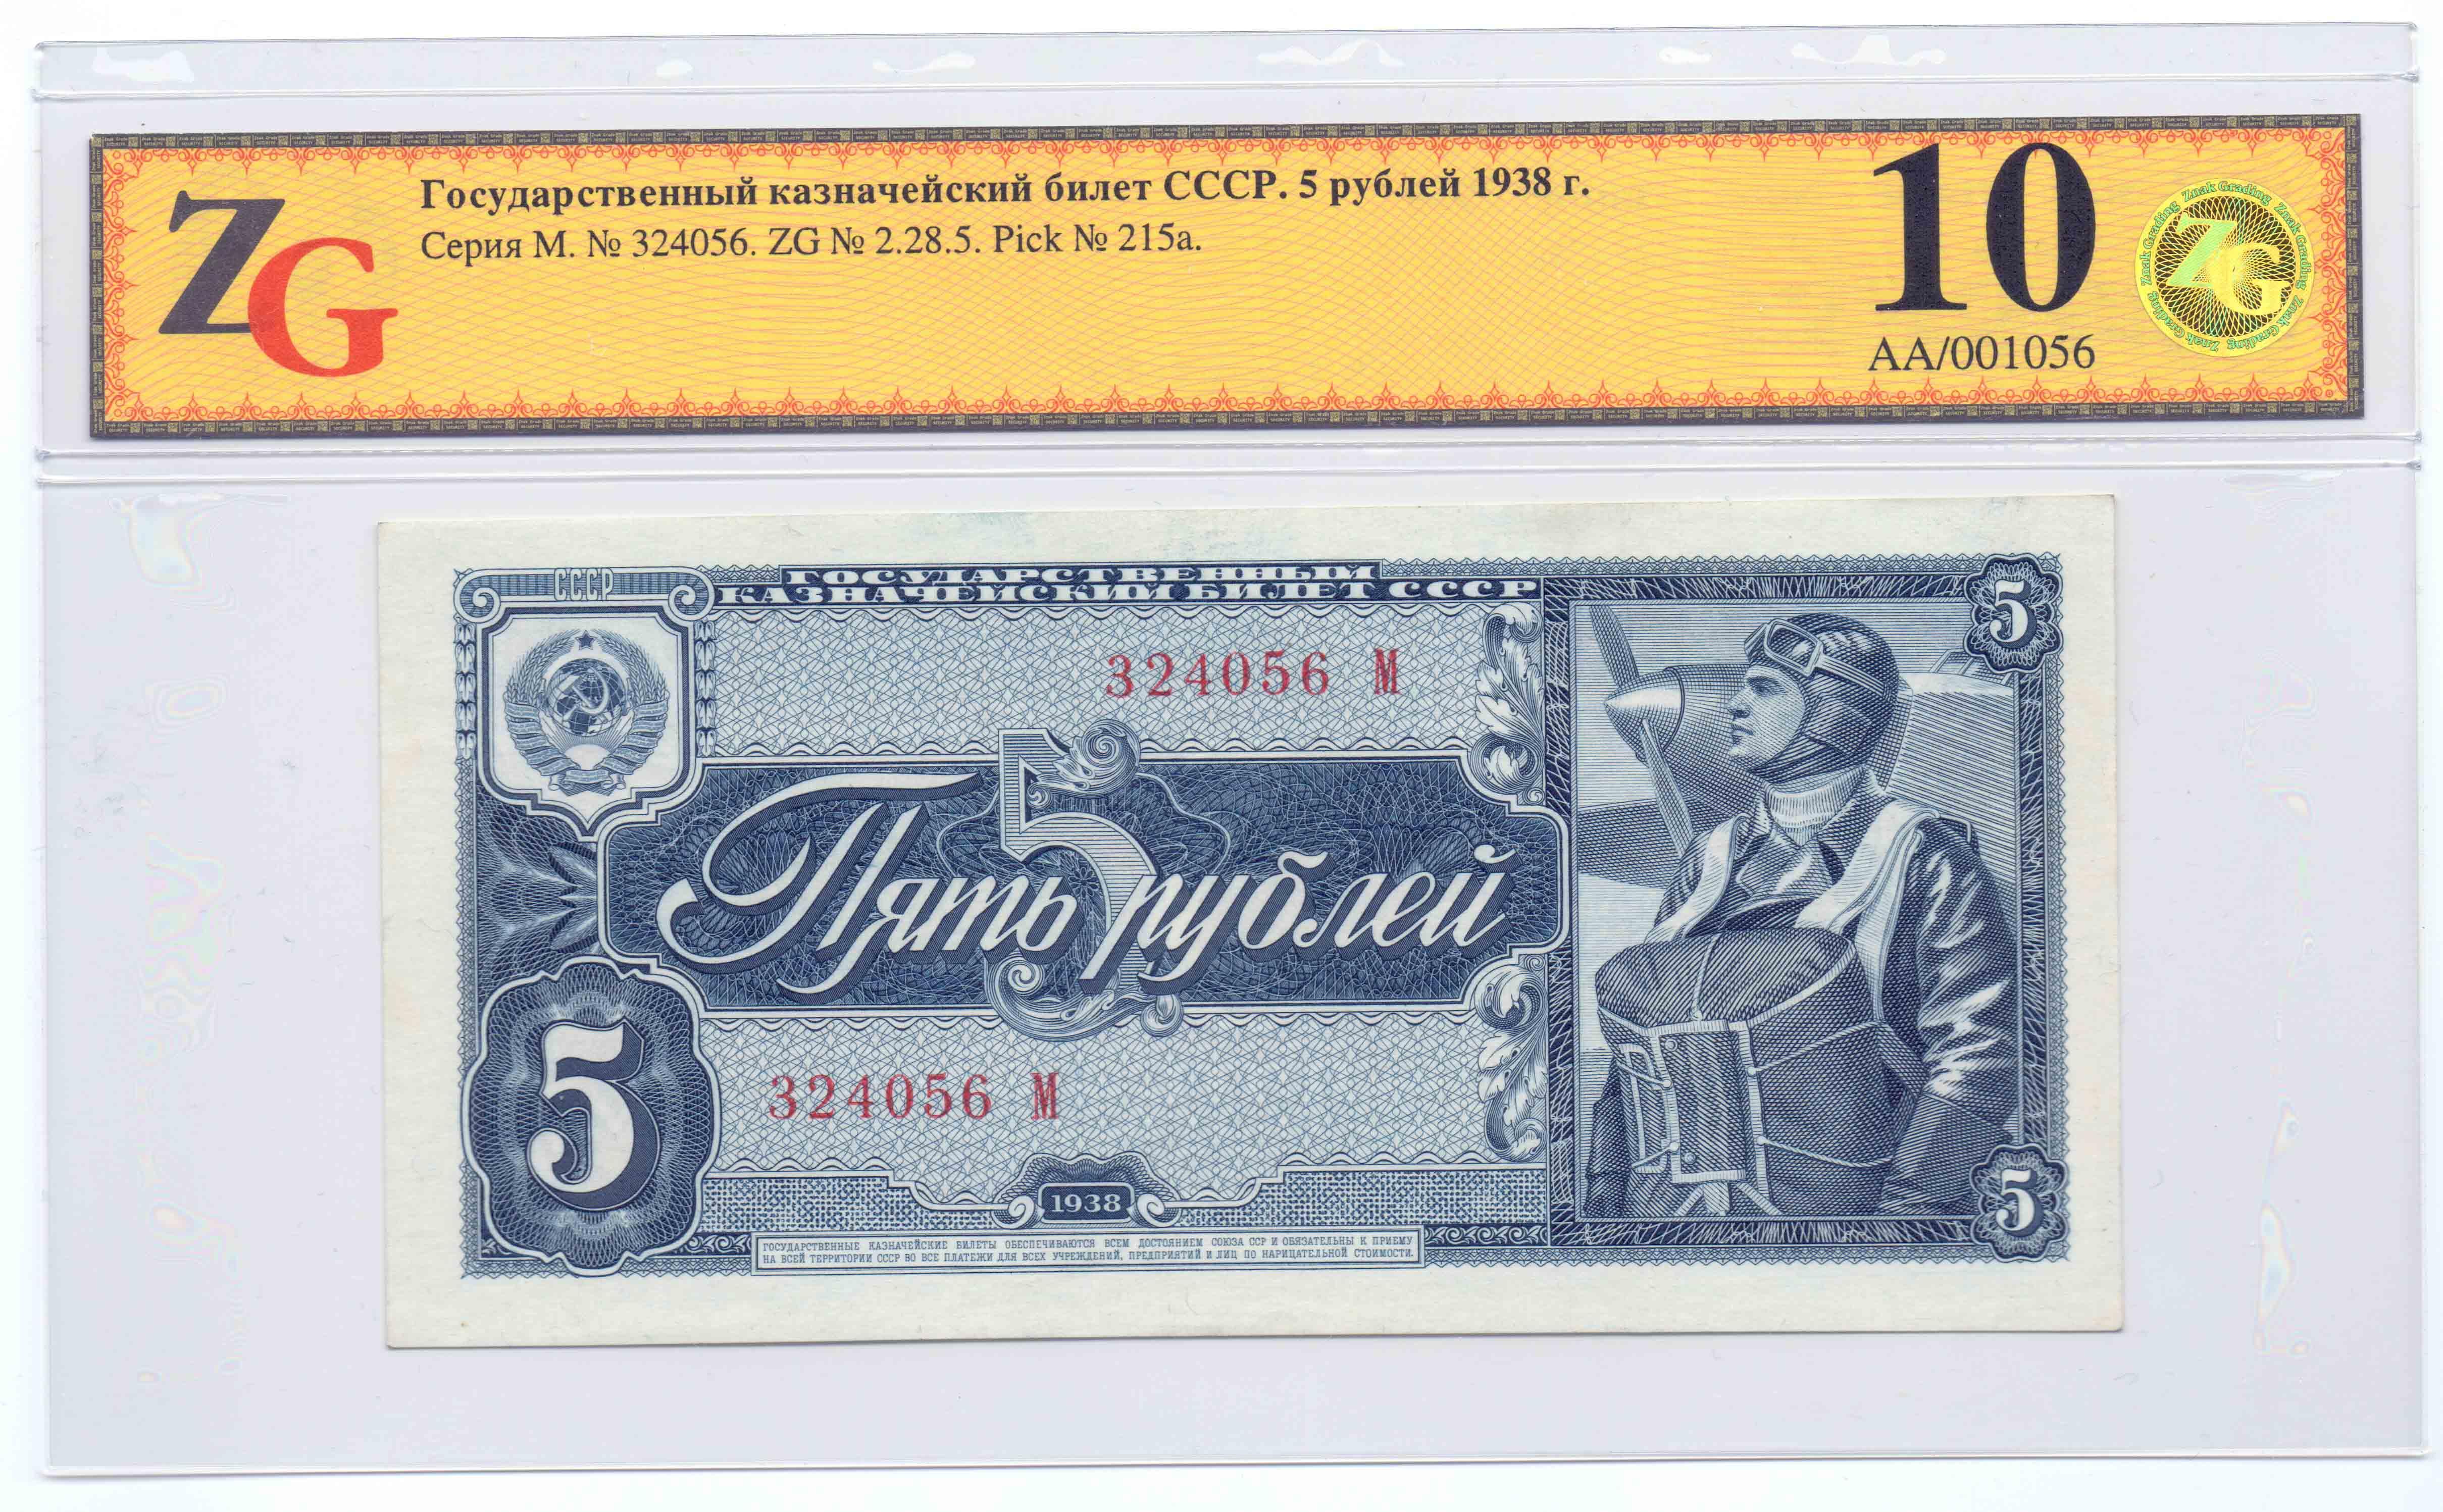 5 рублей  1938 г. М 324056 ZG № 2.28.5. 63 GUnc Pick.215a